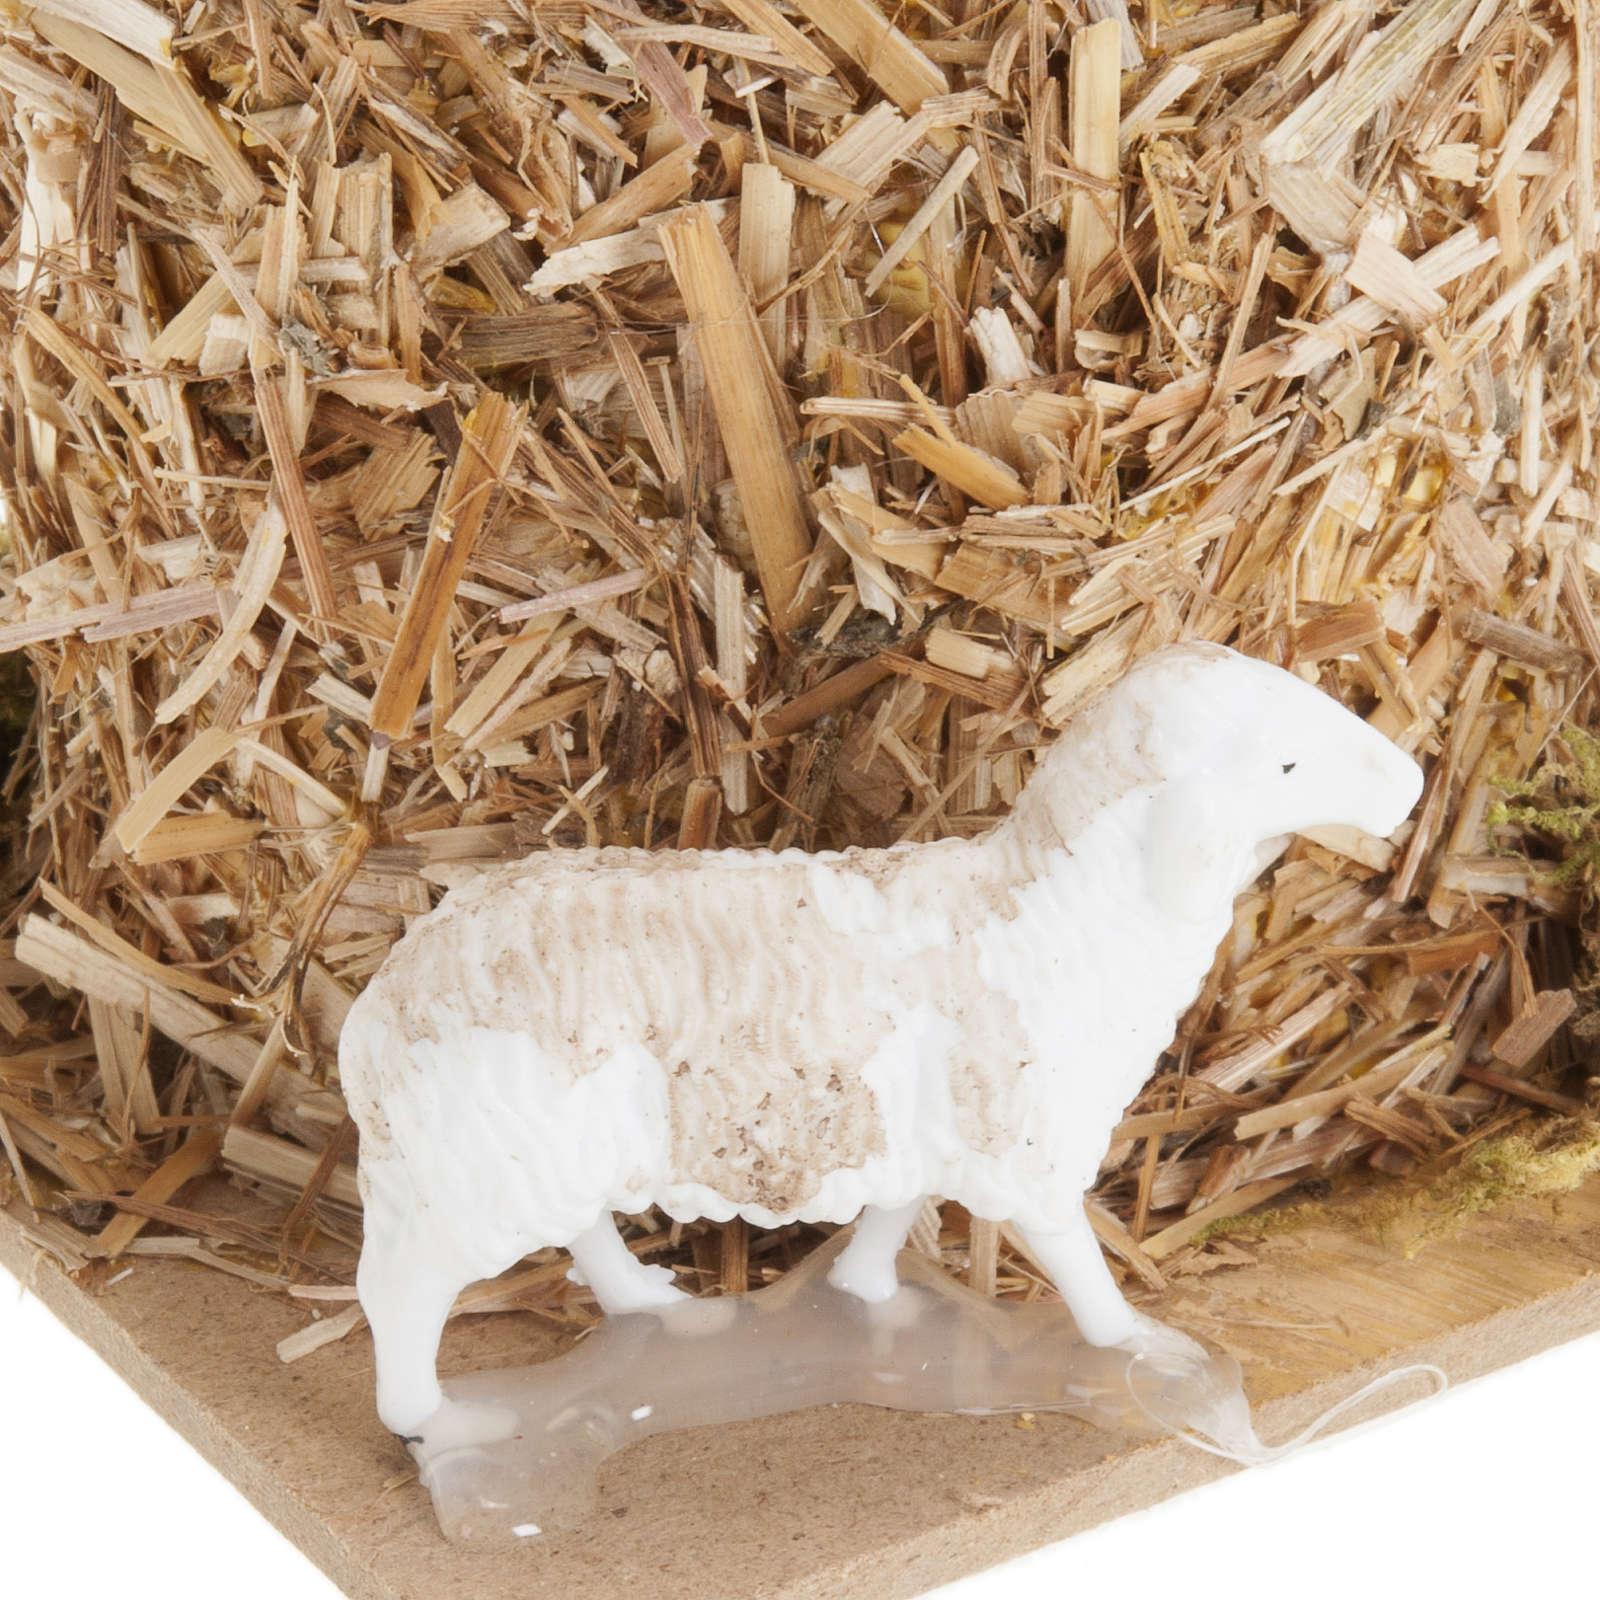 Nativity scene, sheaf of straw with sheep 10, 12cm 3